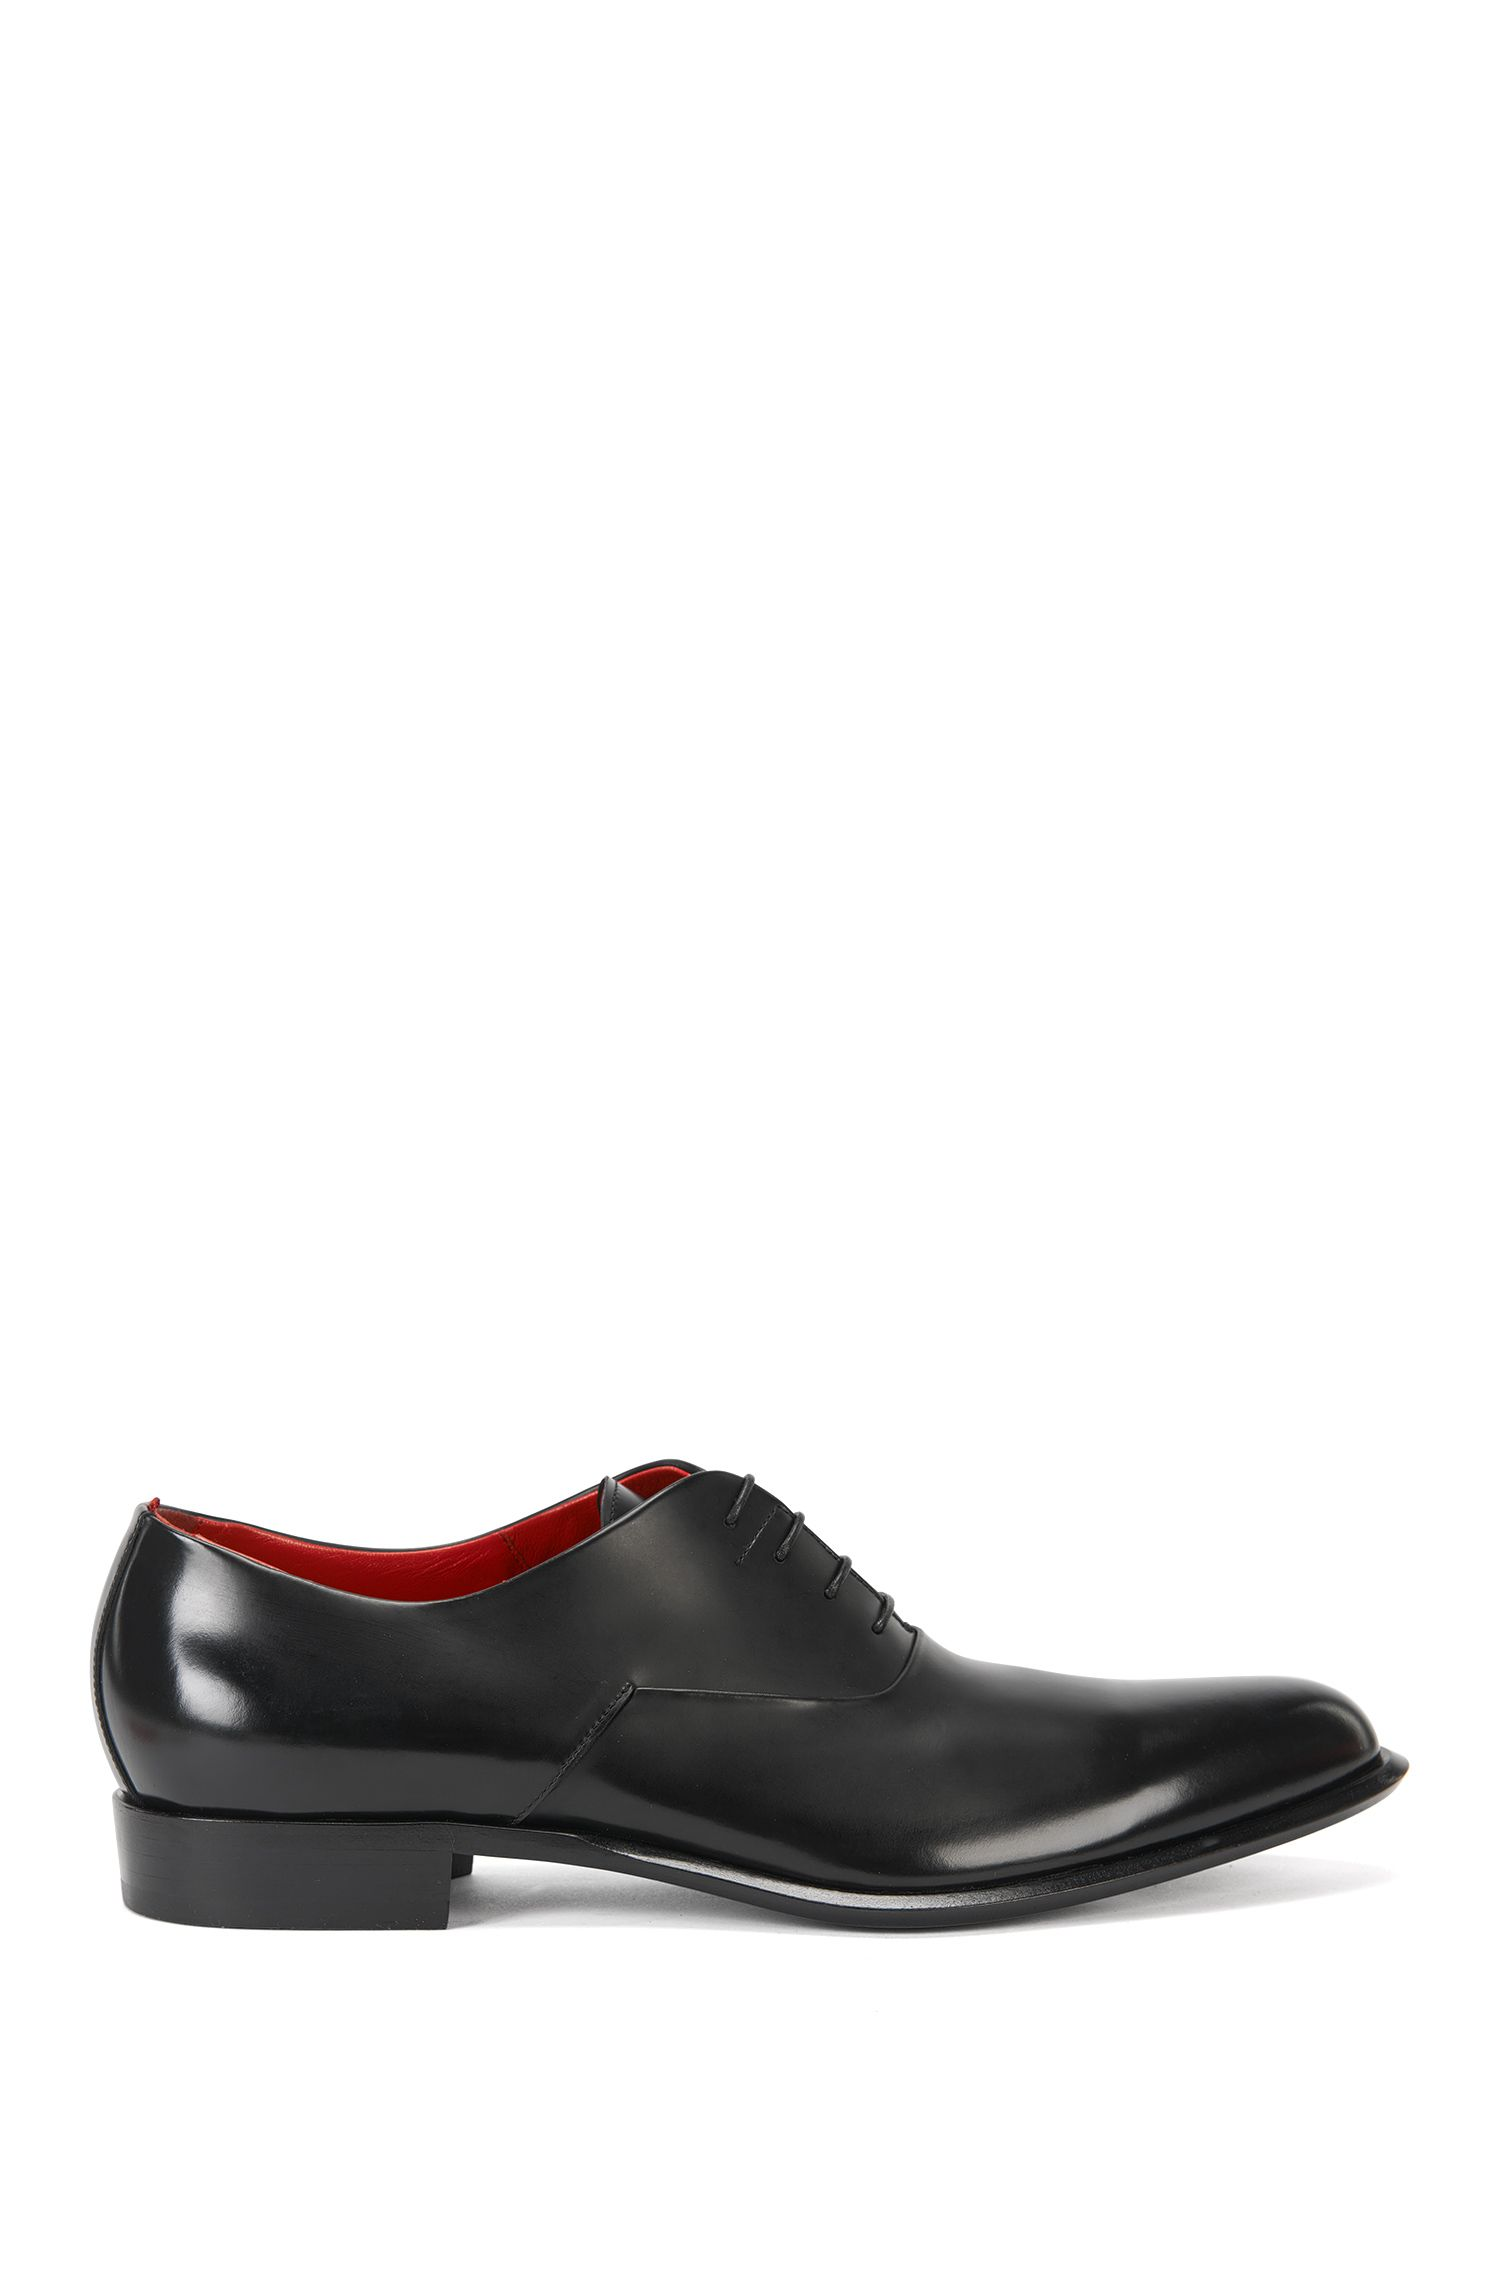 Italienische Oxford-Schuhe aus edlem Leder